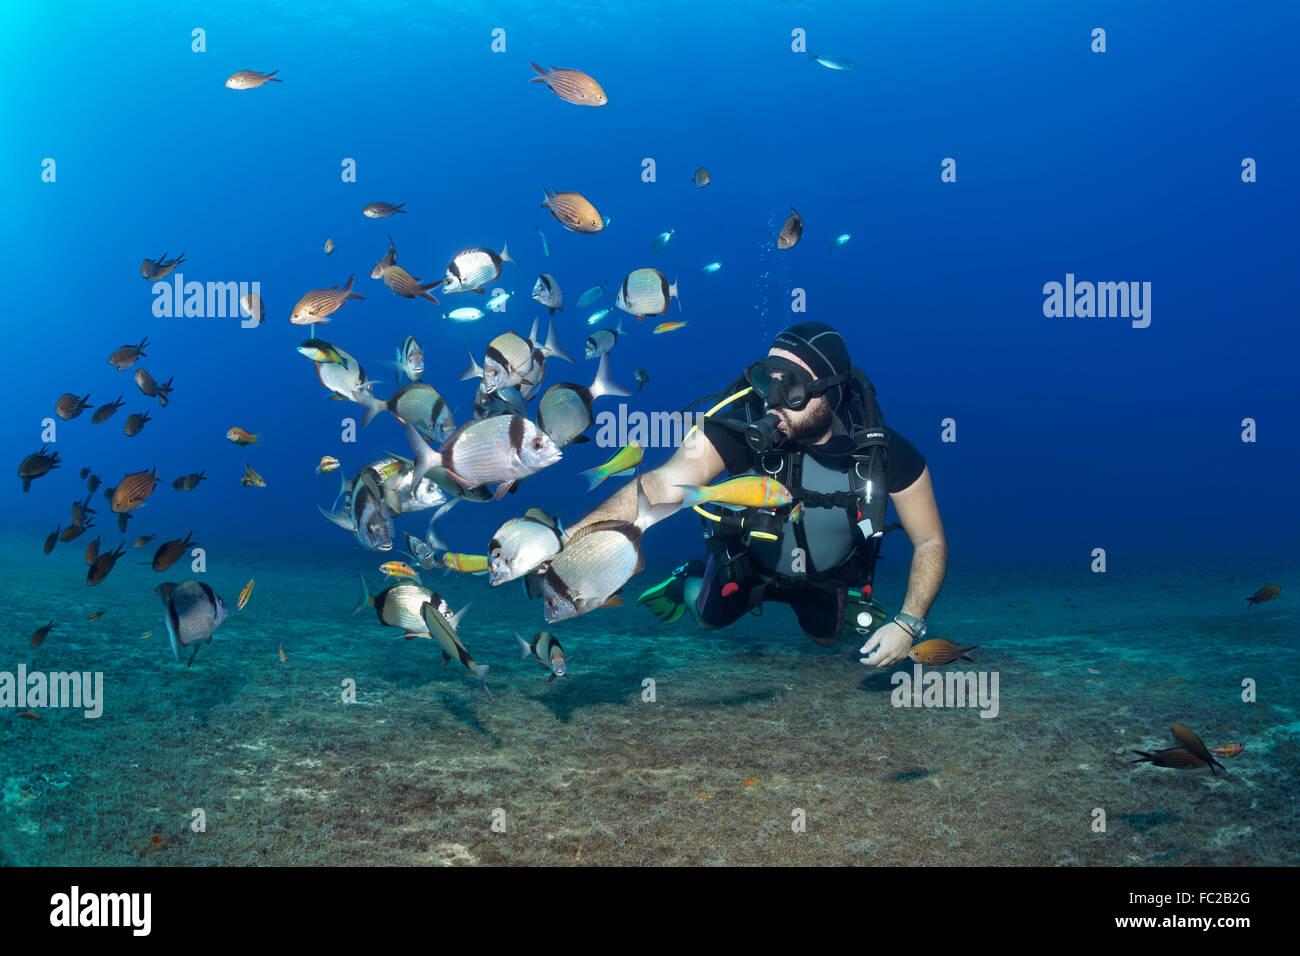 Diver feeding fish, White seabream or Sargo (Diplodus sargus), Larnaca, Cyprus - Stock Image